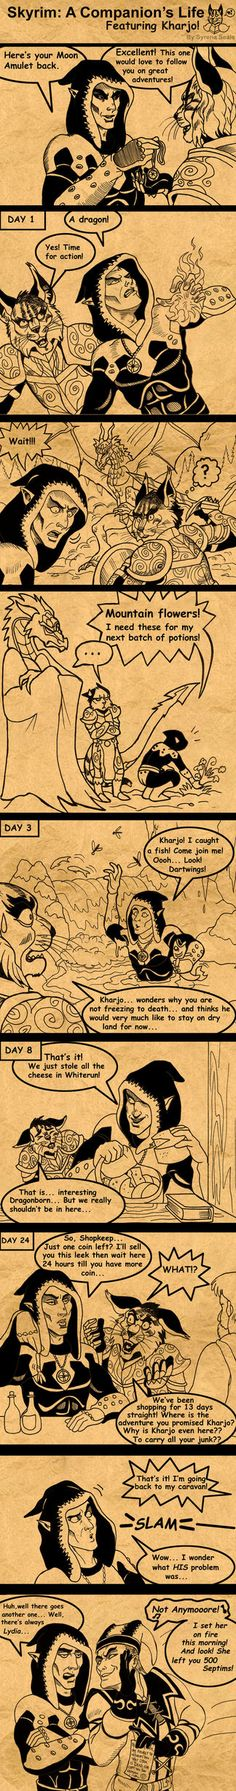 Skyrim A Companion's Life by =SlayerSyrena on deviantART